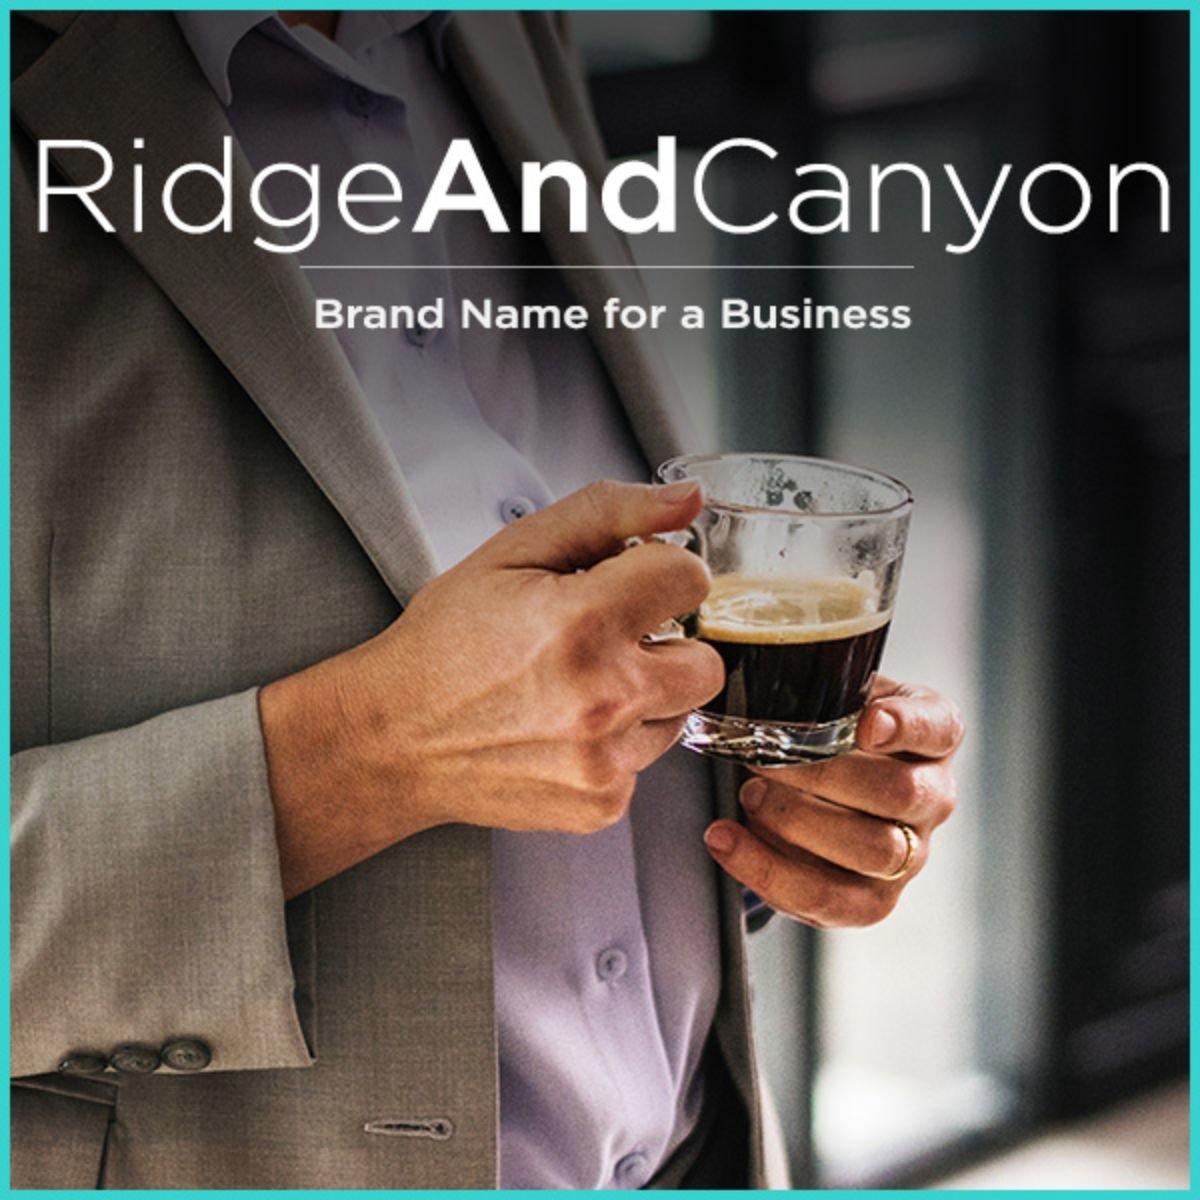 RidgeandCanyon